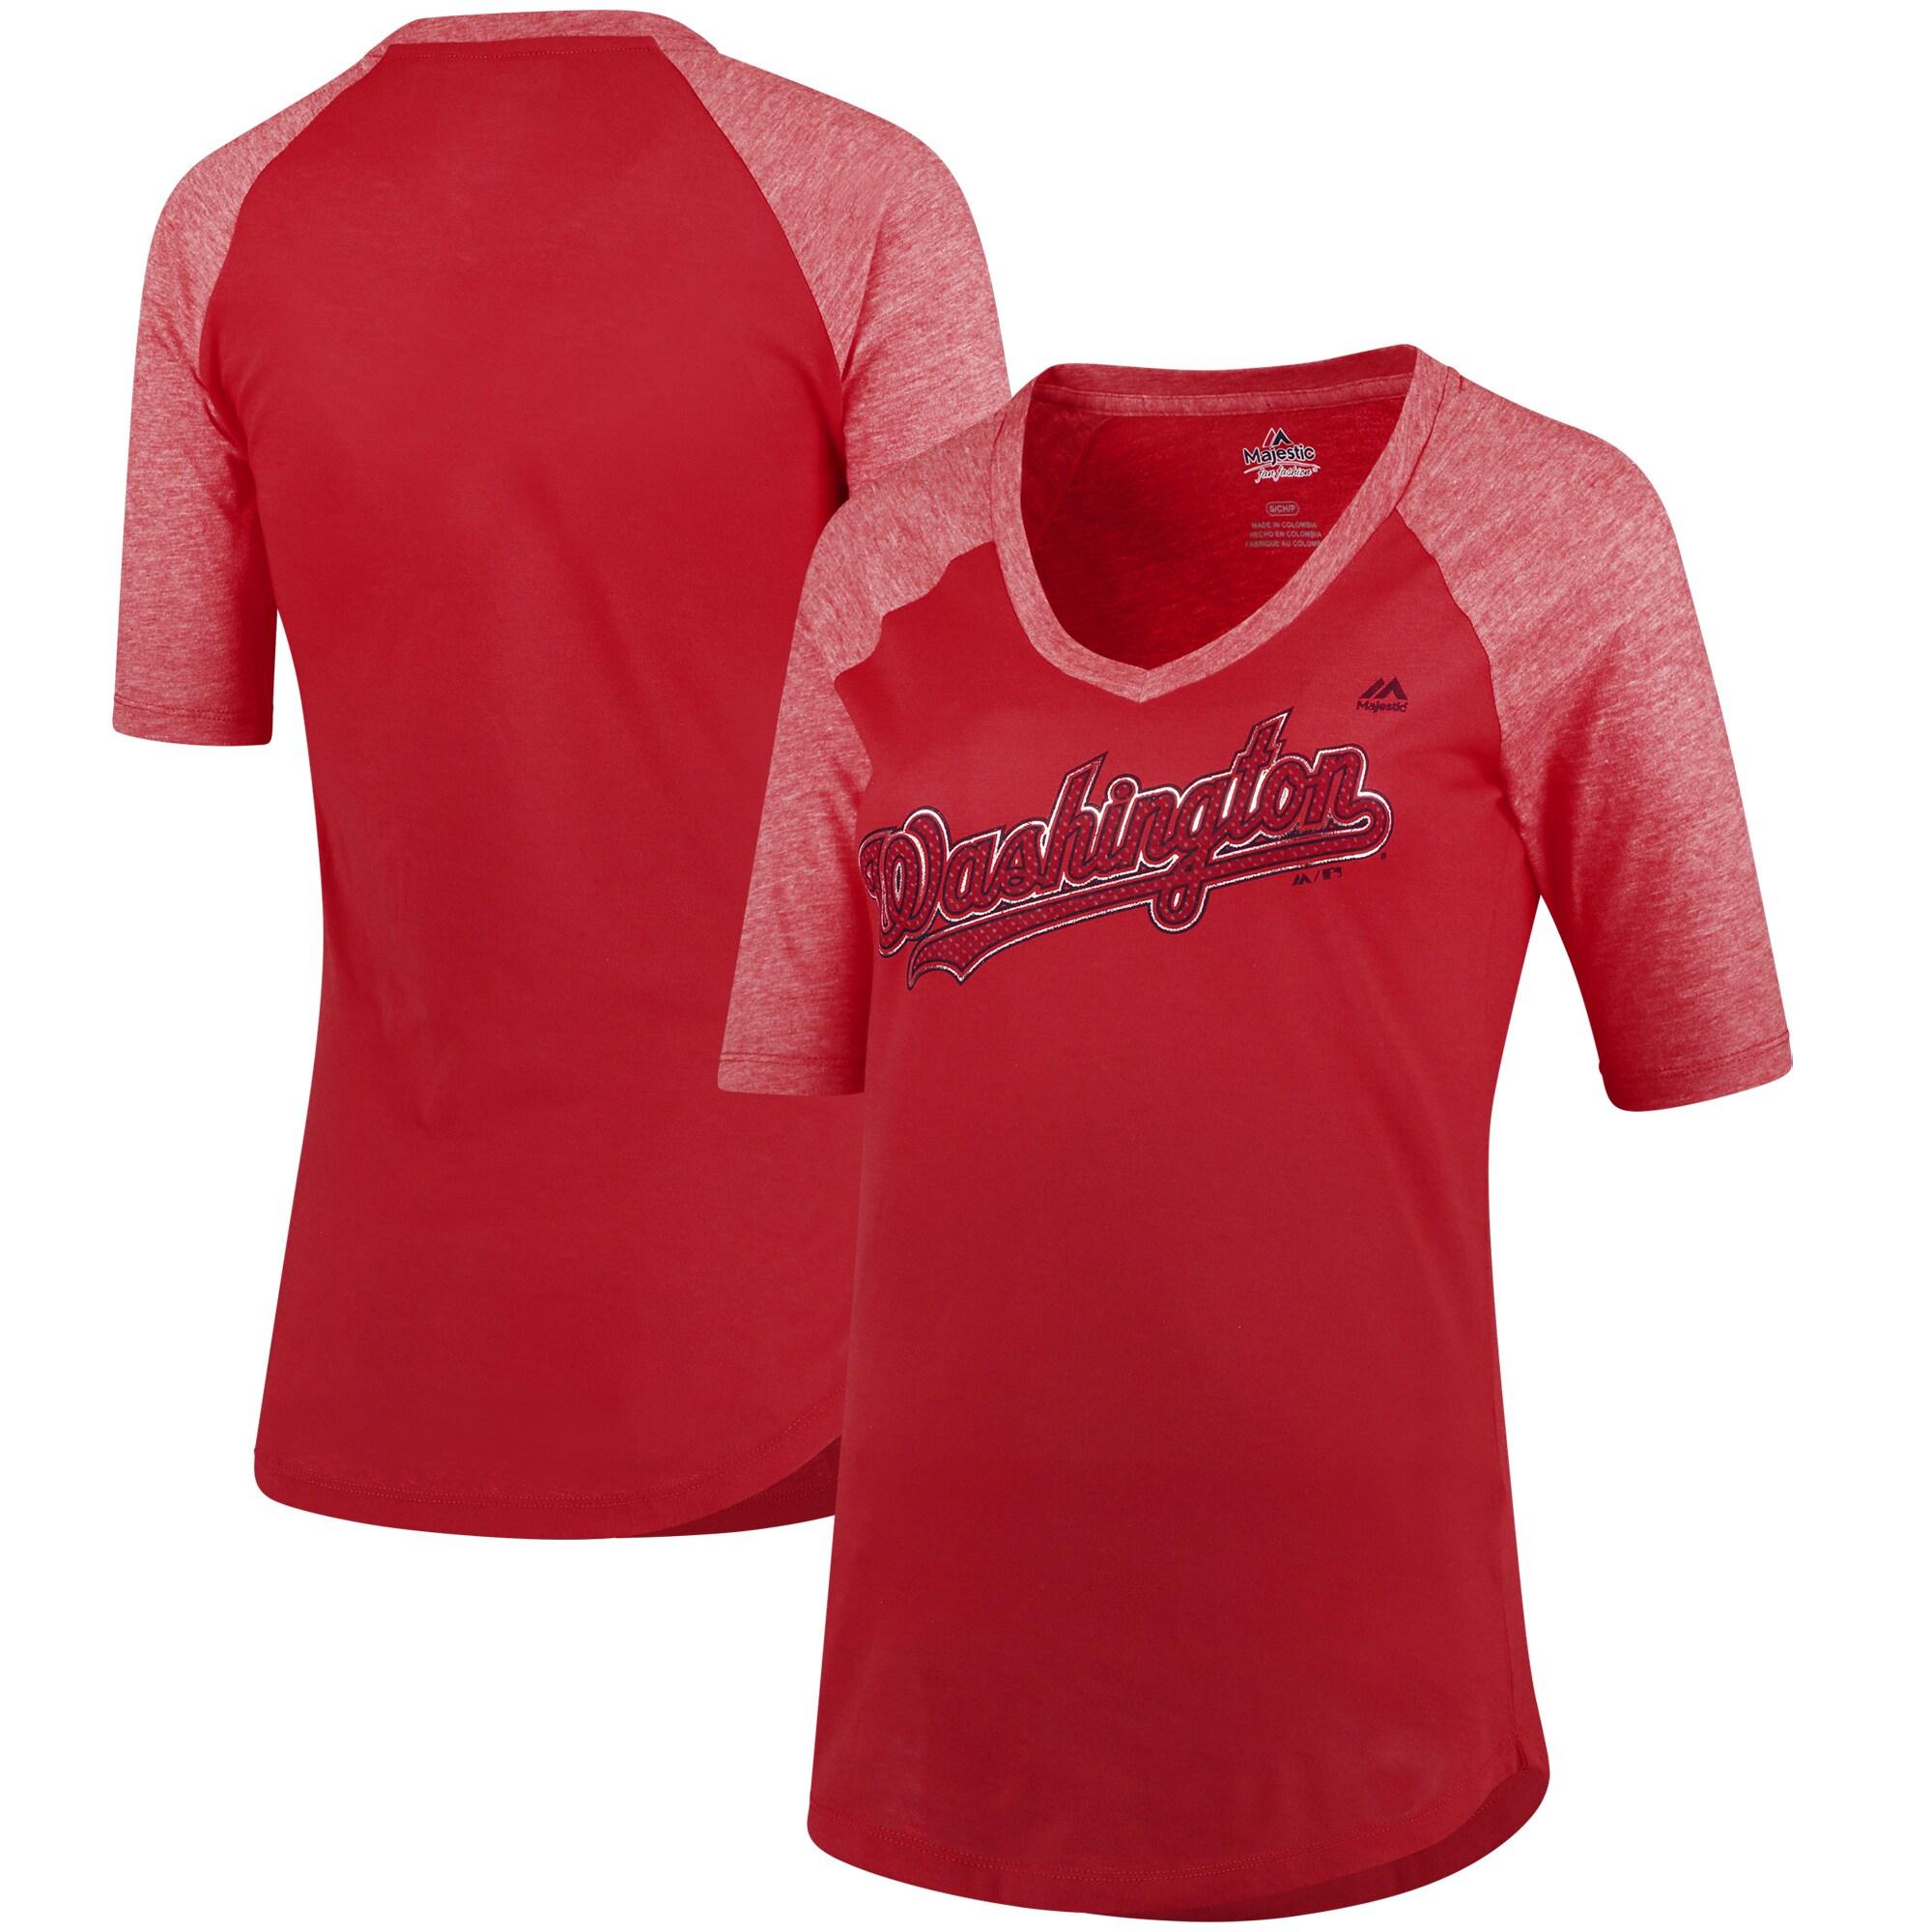 Washington Nationals Majestic Women's Quick Hands Raglan Half-Sleeve T-Shirt - Red